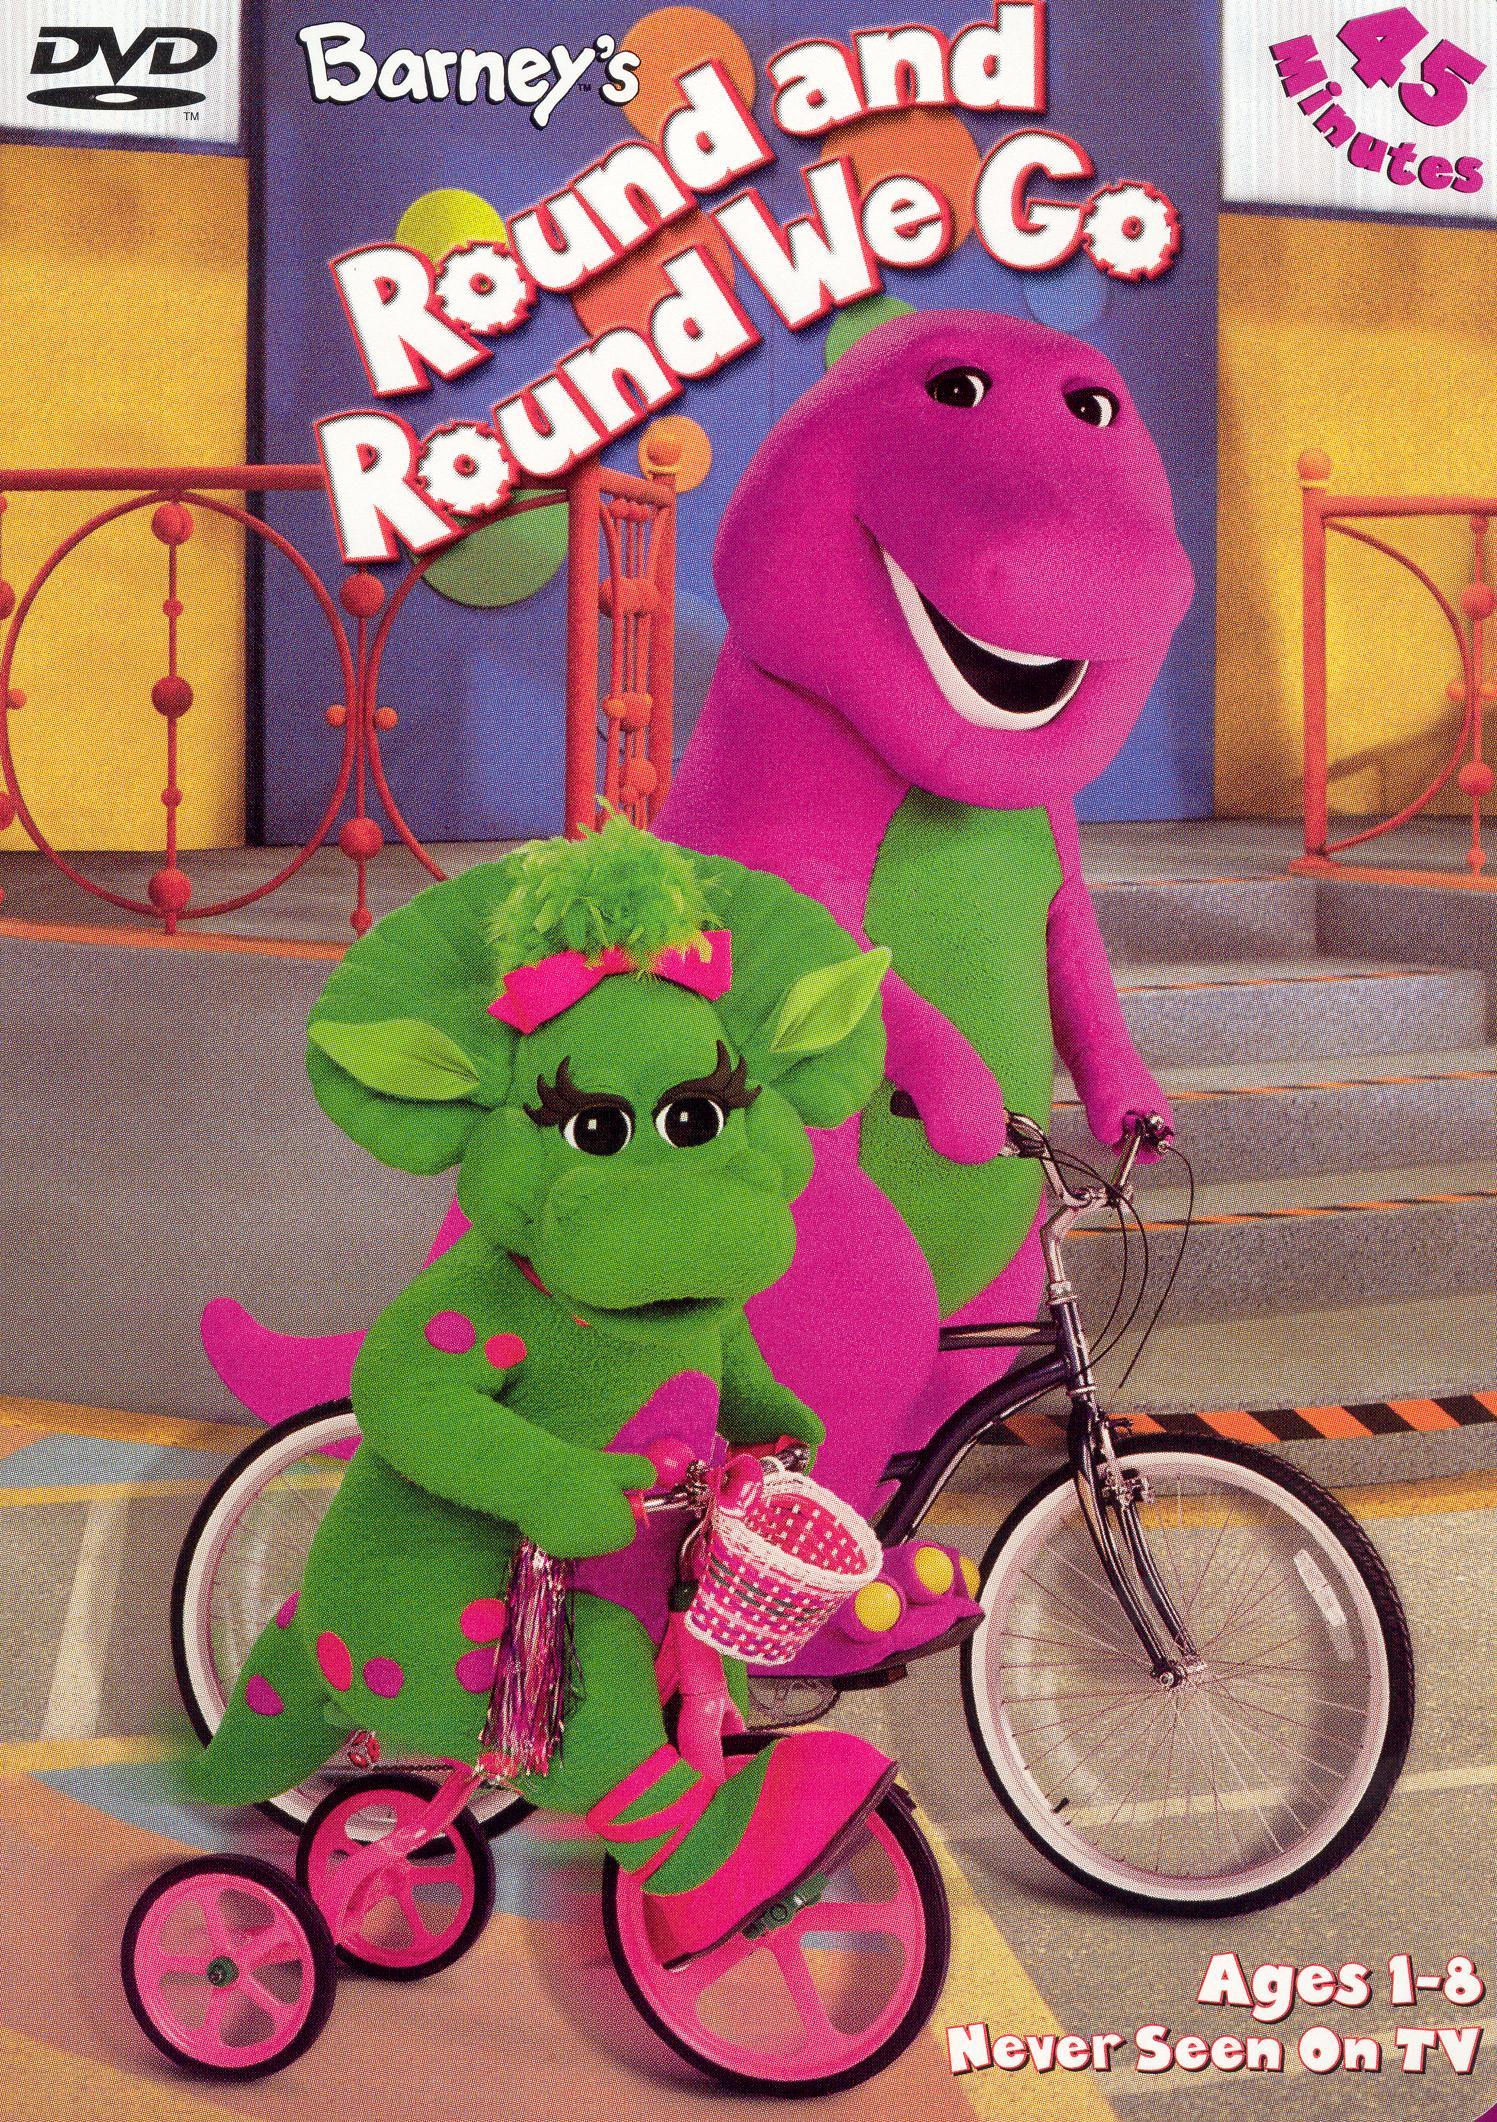 Barney: Barney's Round and Round We Go